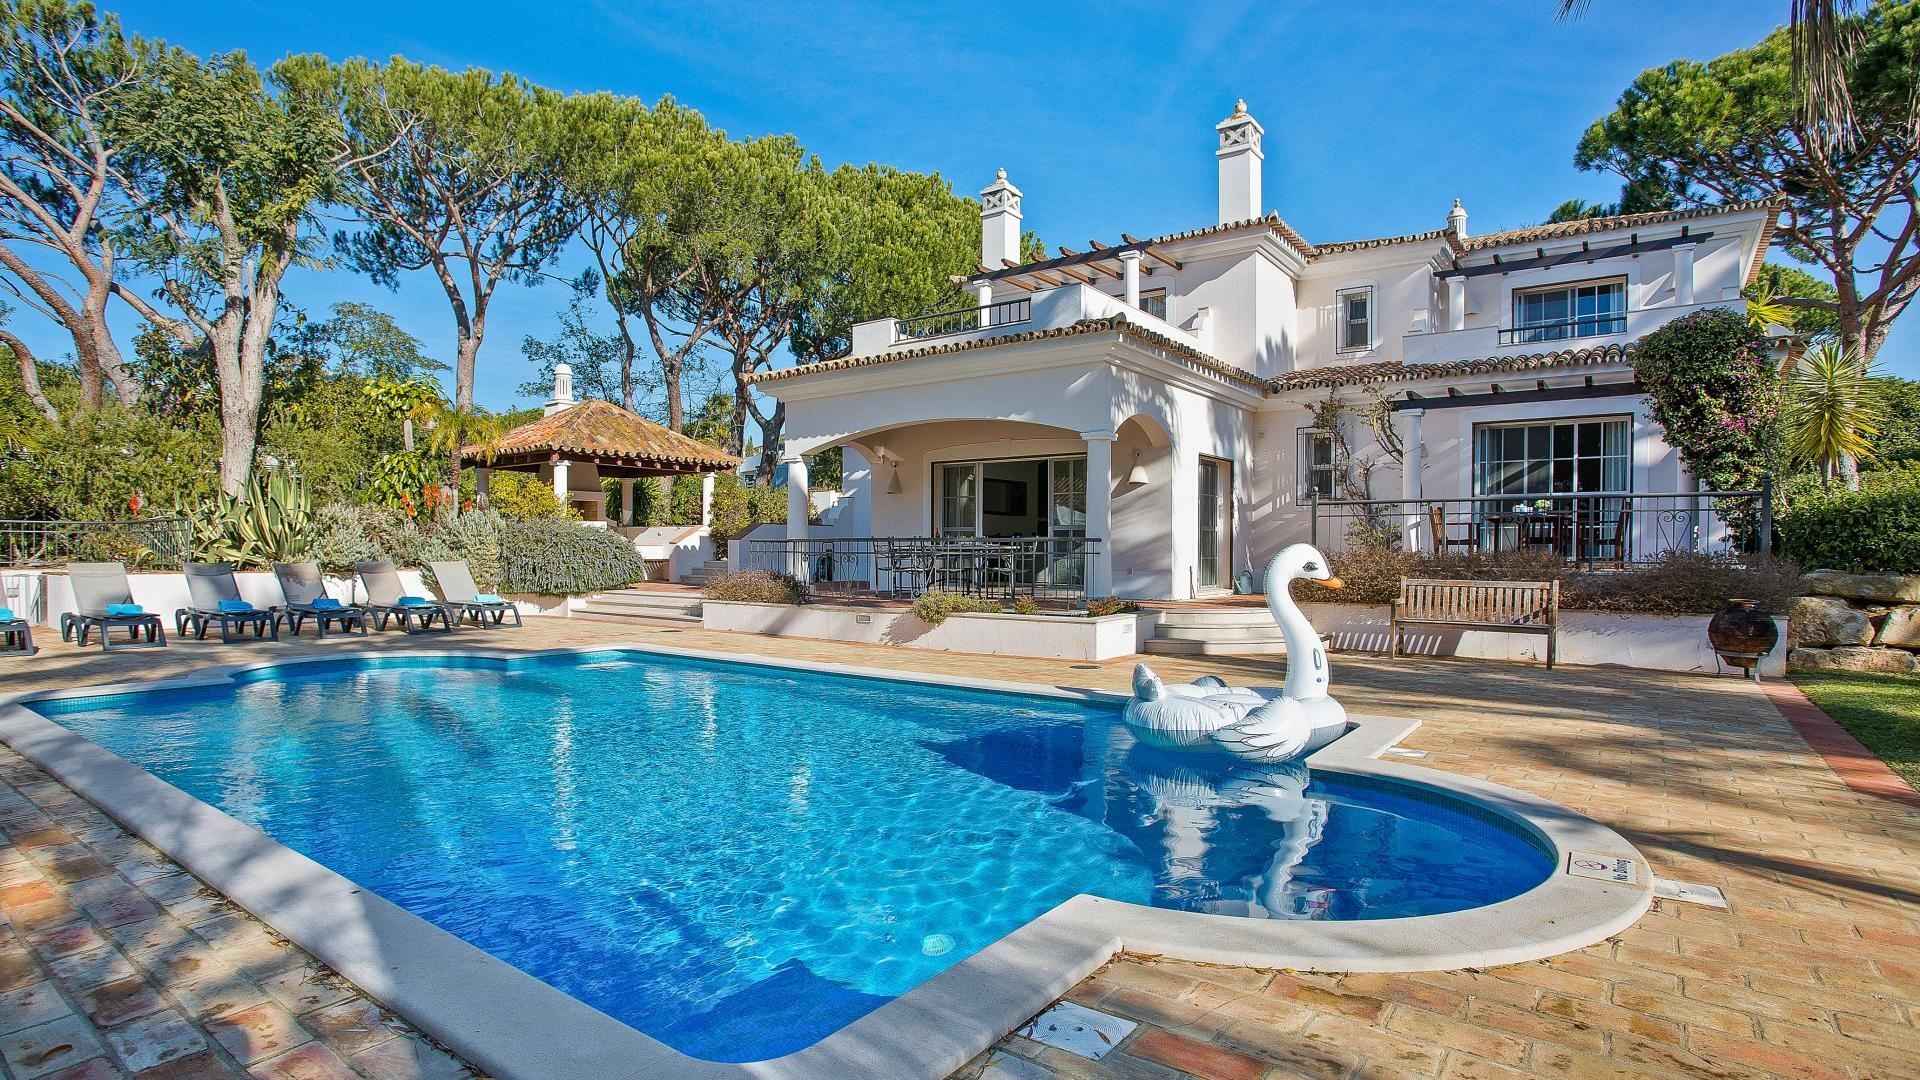 Villa Seis - Pinheiros Altos, Quinta do Lago, Algarve - _P1_0770_-_Copy_2.jpg